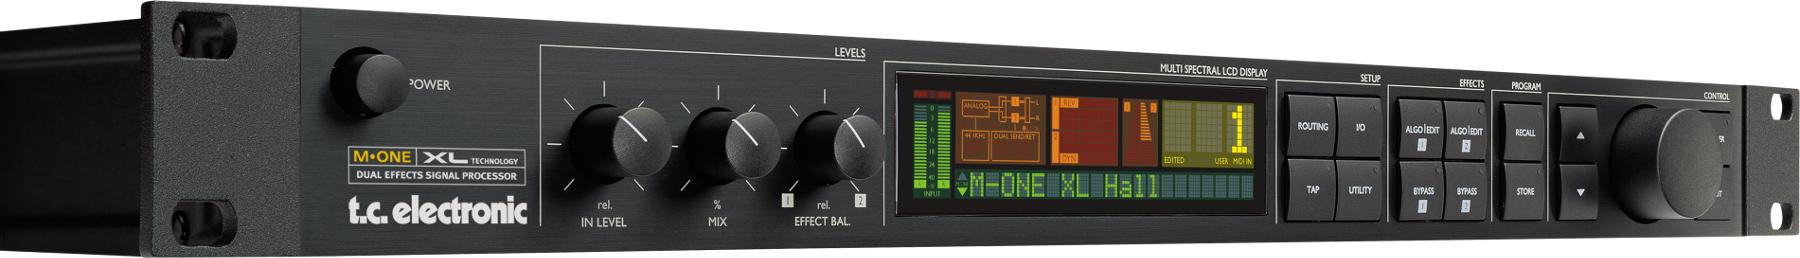 Tc Electronic M1 Xl M One Xl Dual Effects Signal Processor